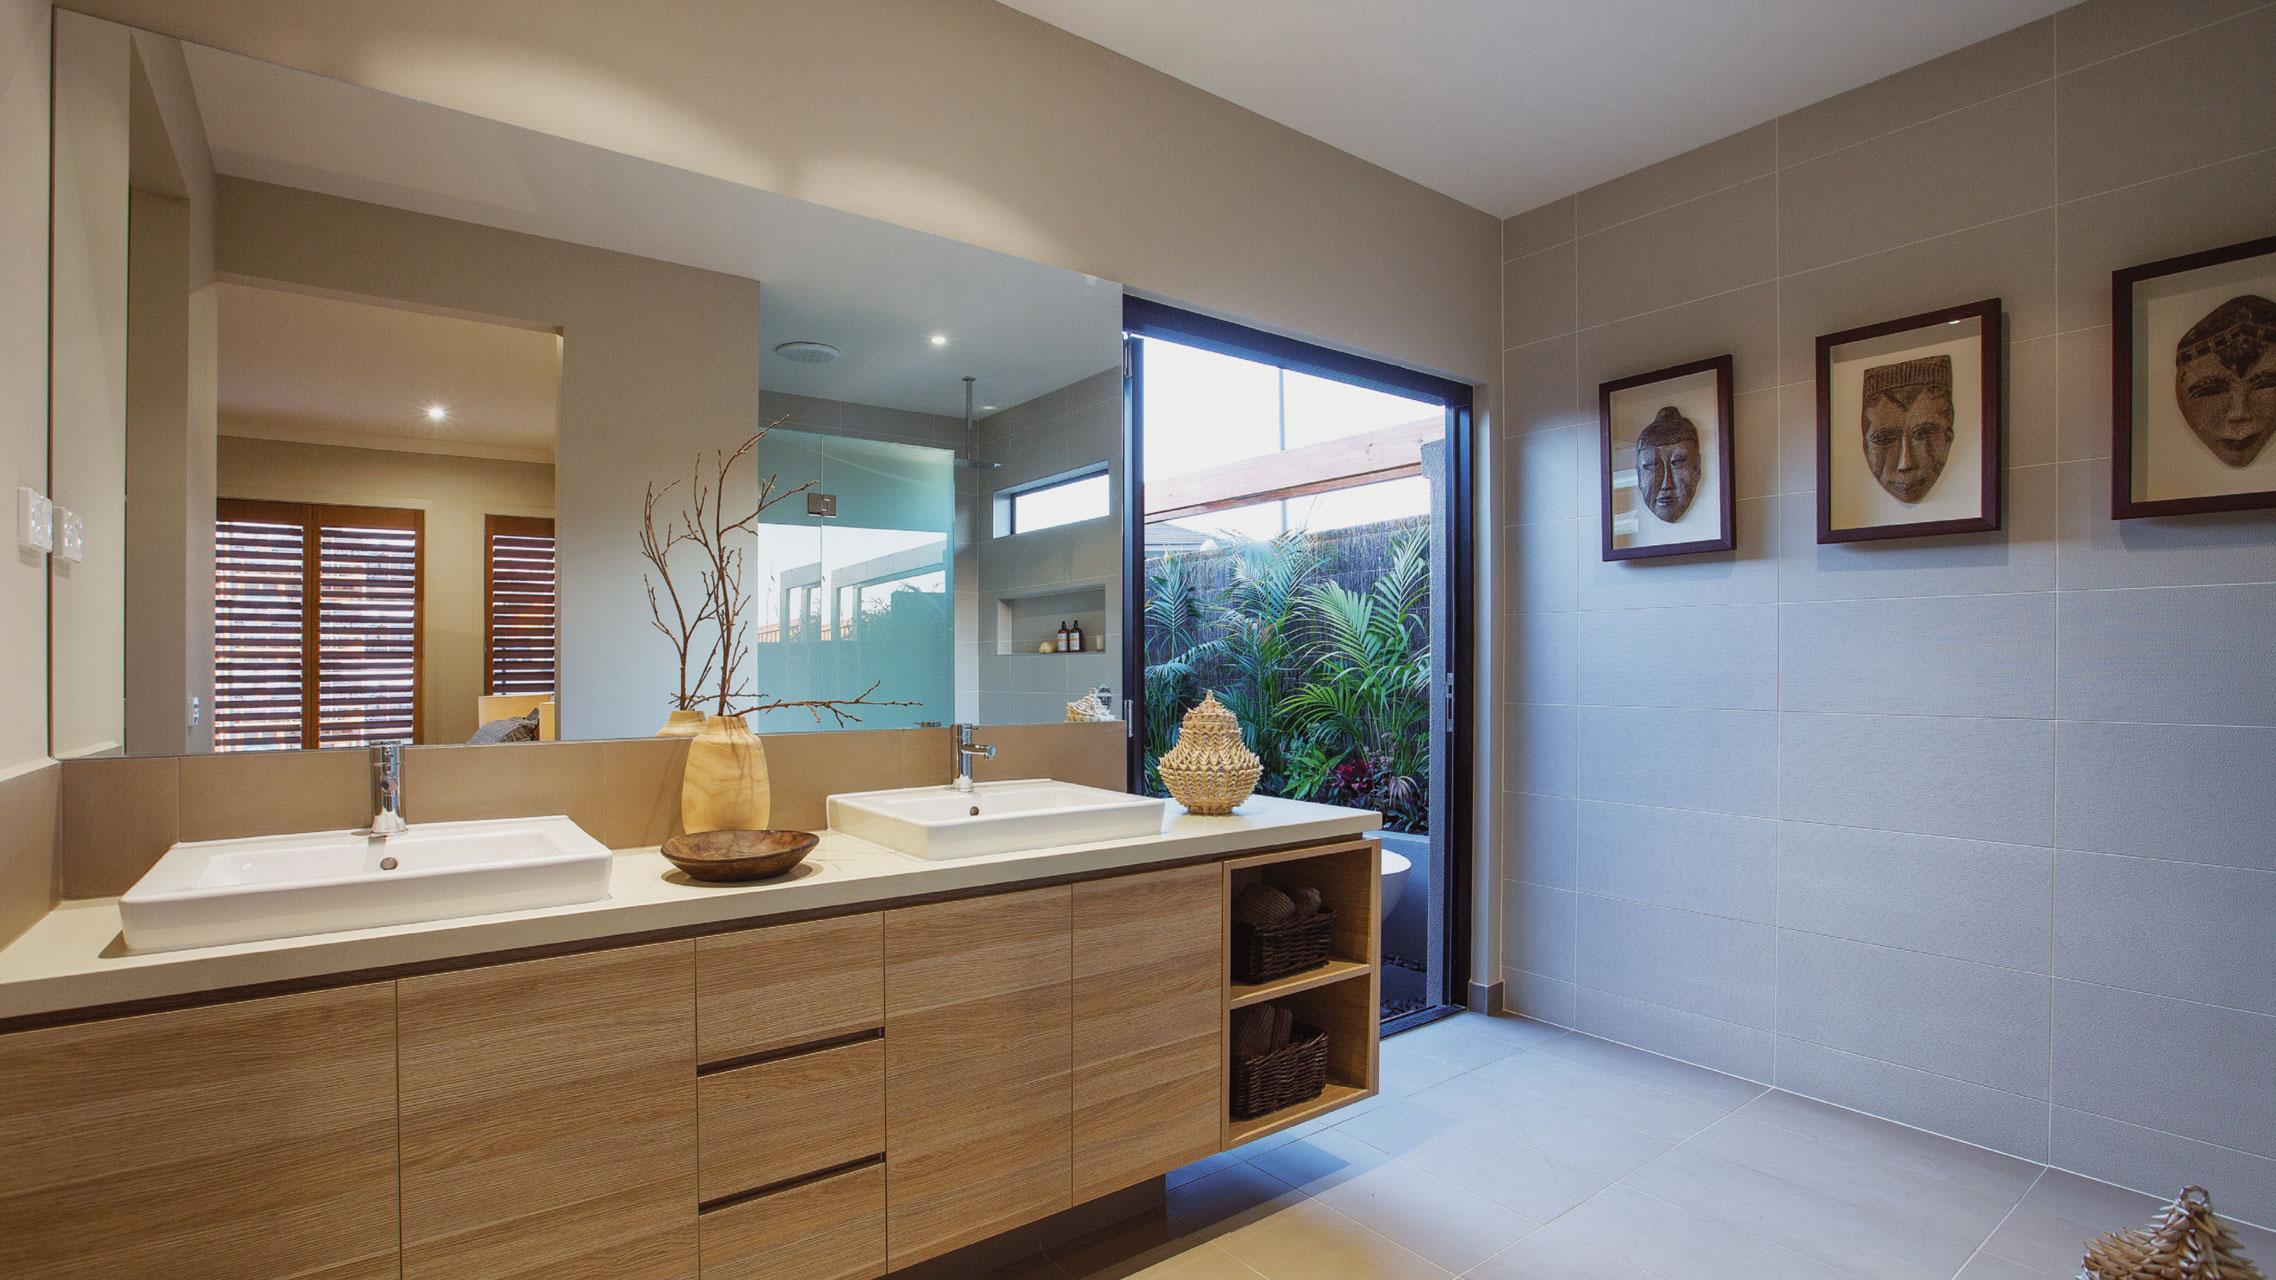 Large Frameless Bathroom Mirror above a vanity next to a bi fold door